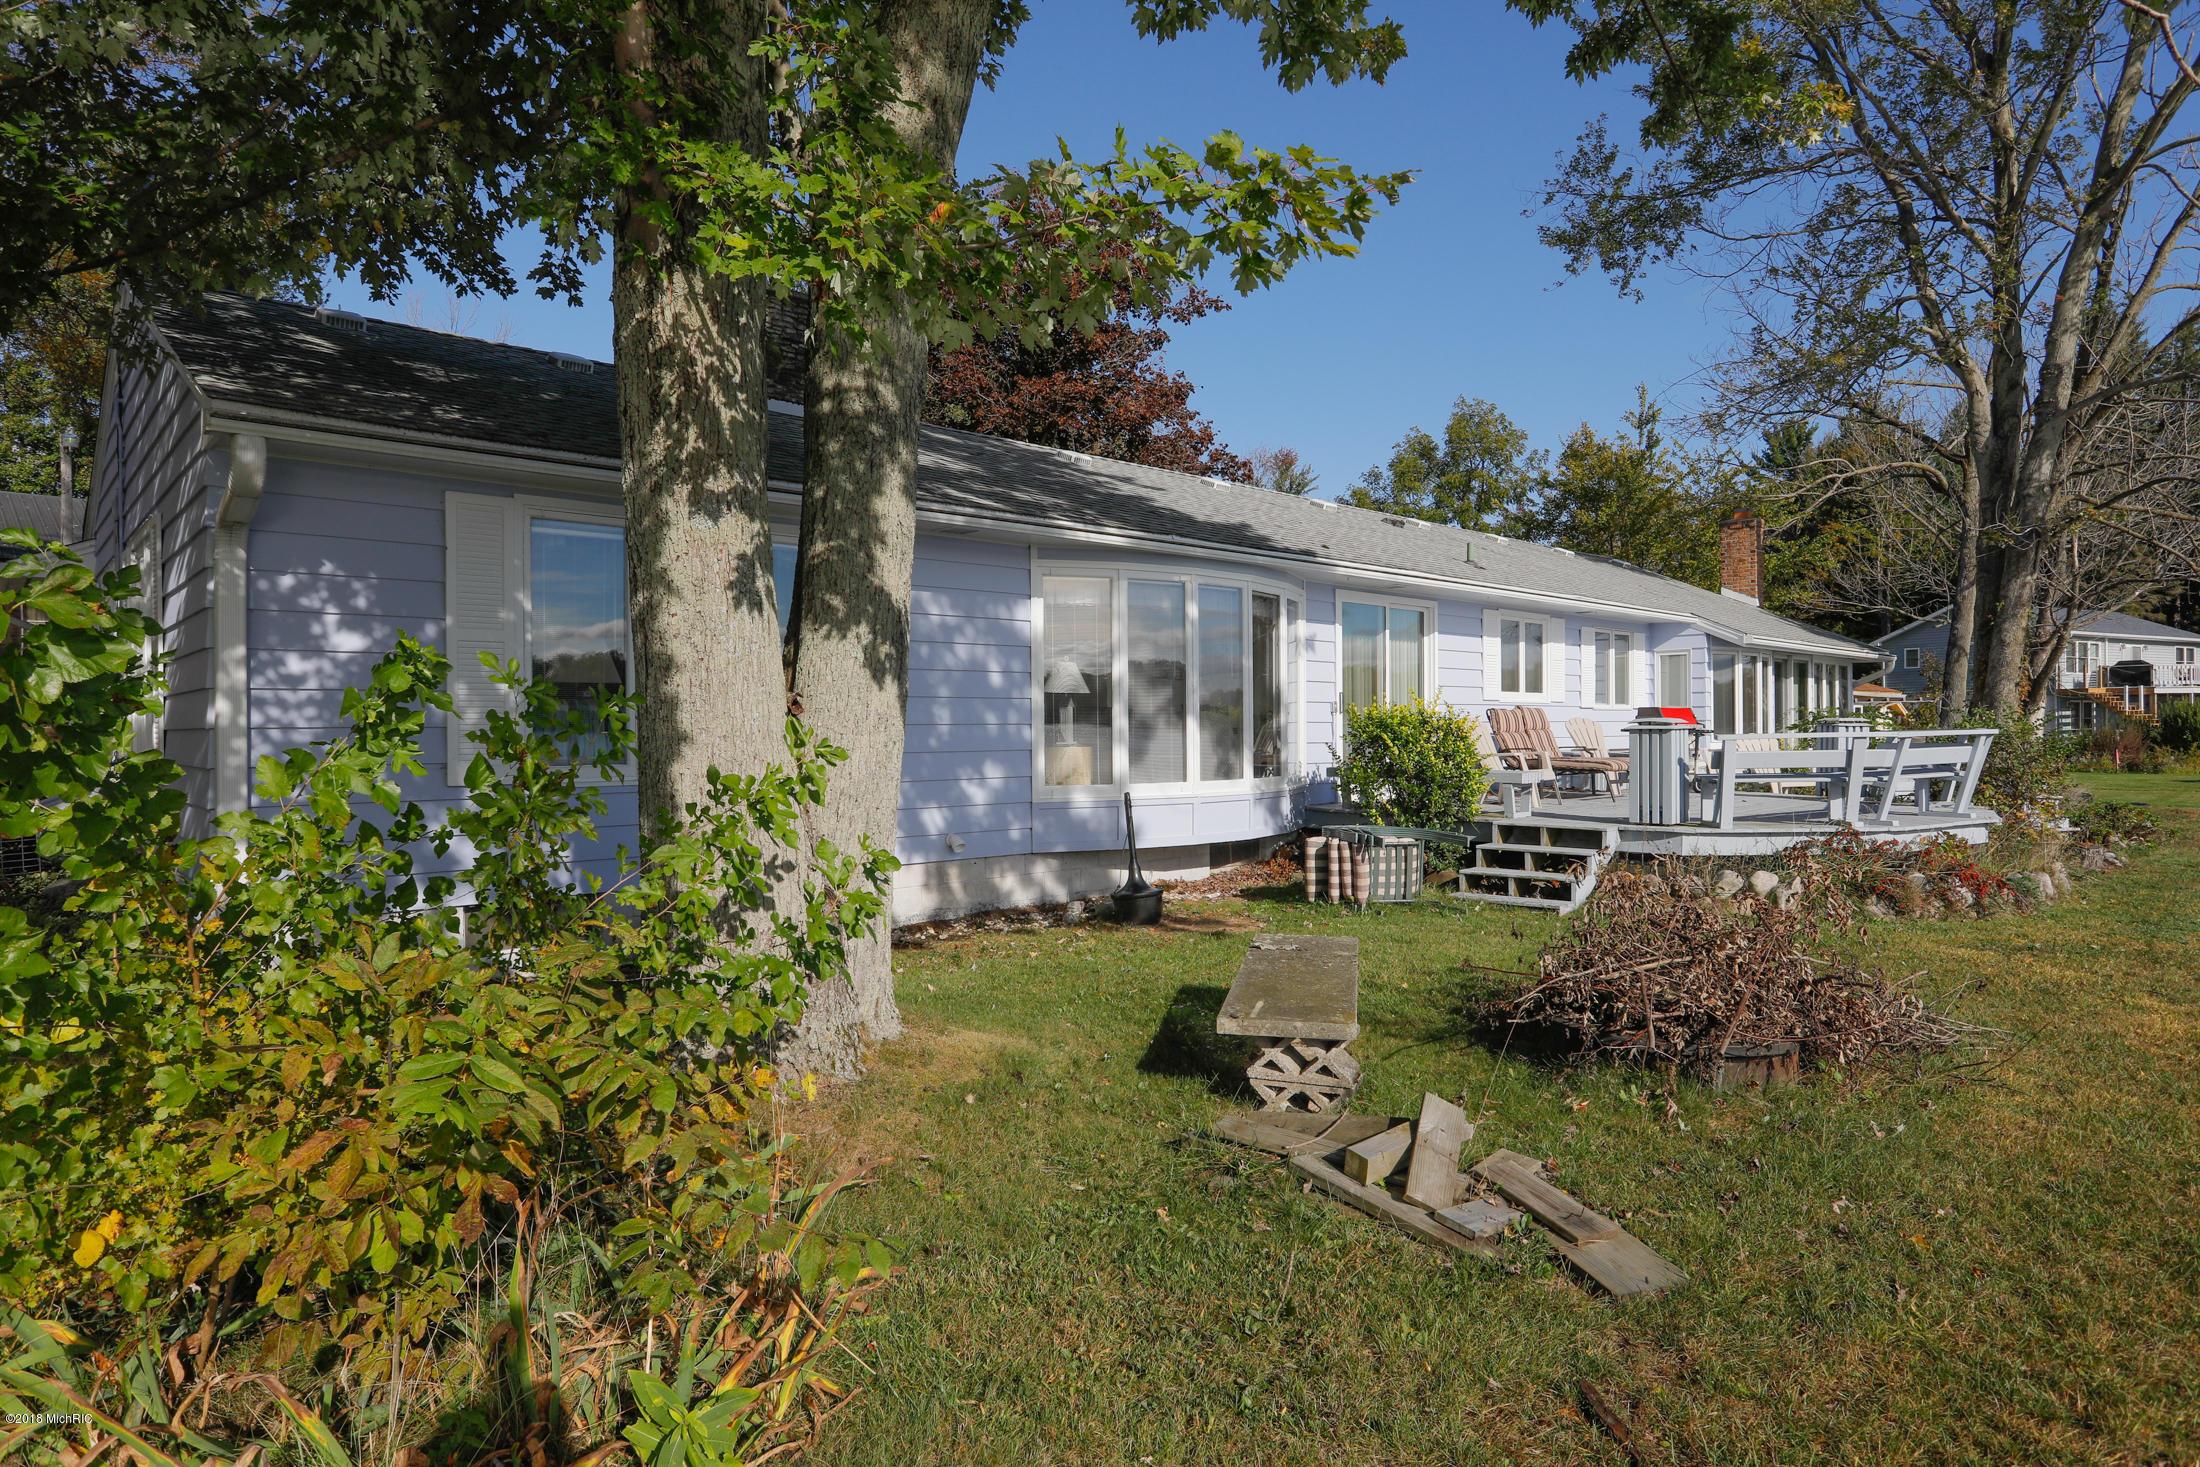 3964 Mary , Bloomingdale, MI 49026 Photo 1